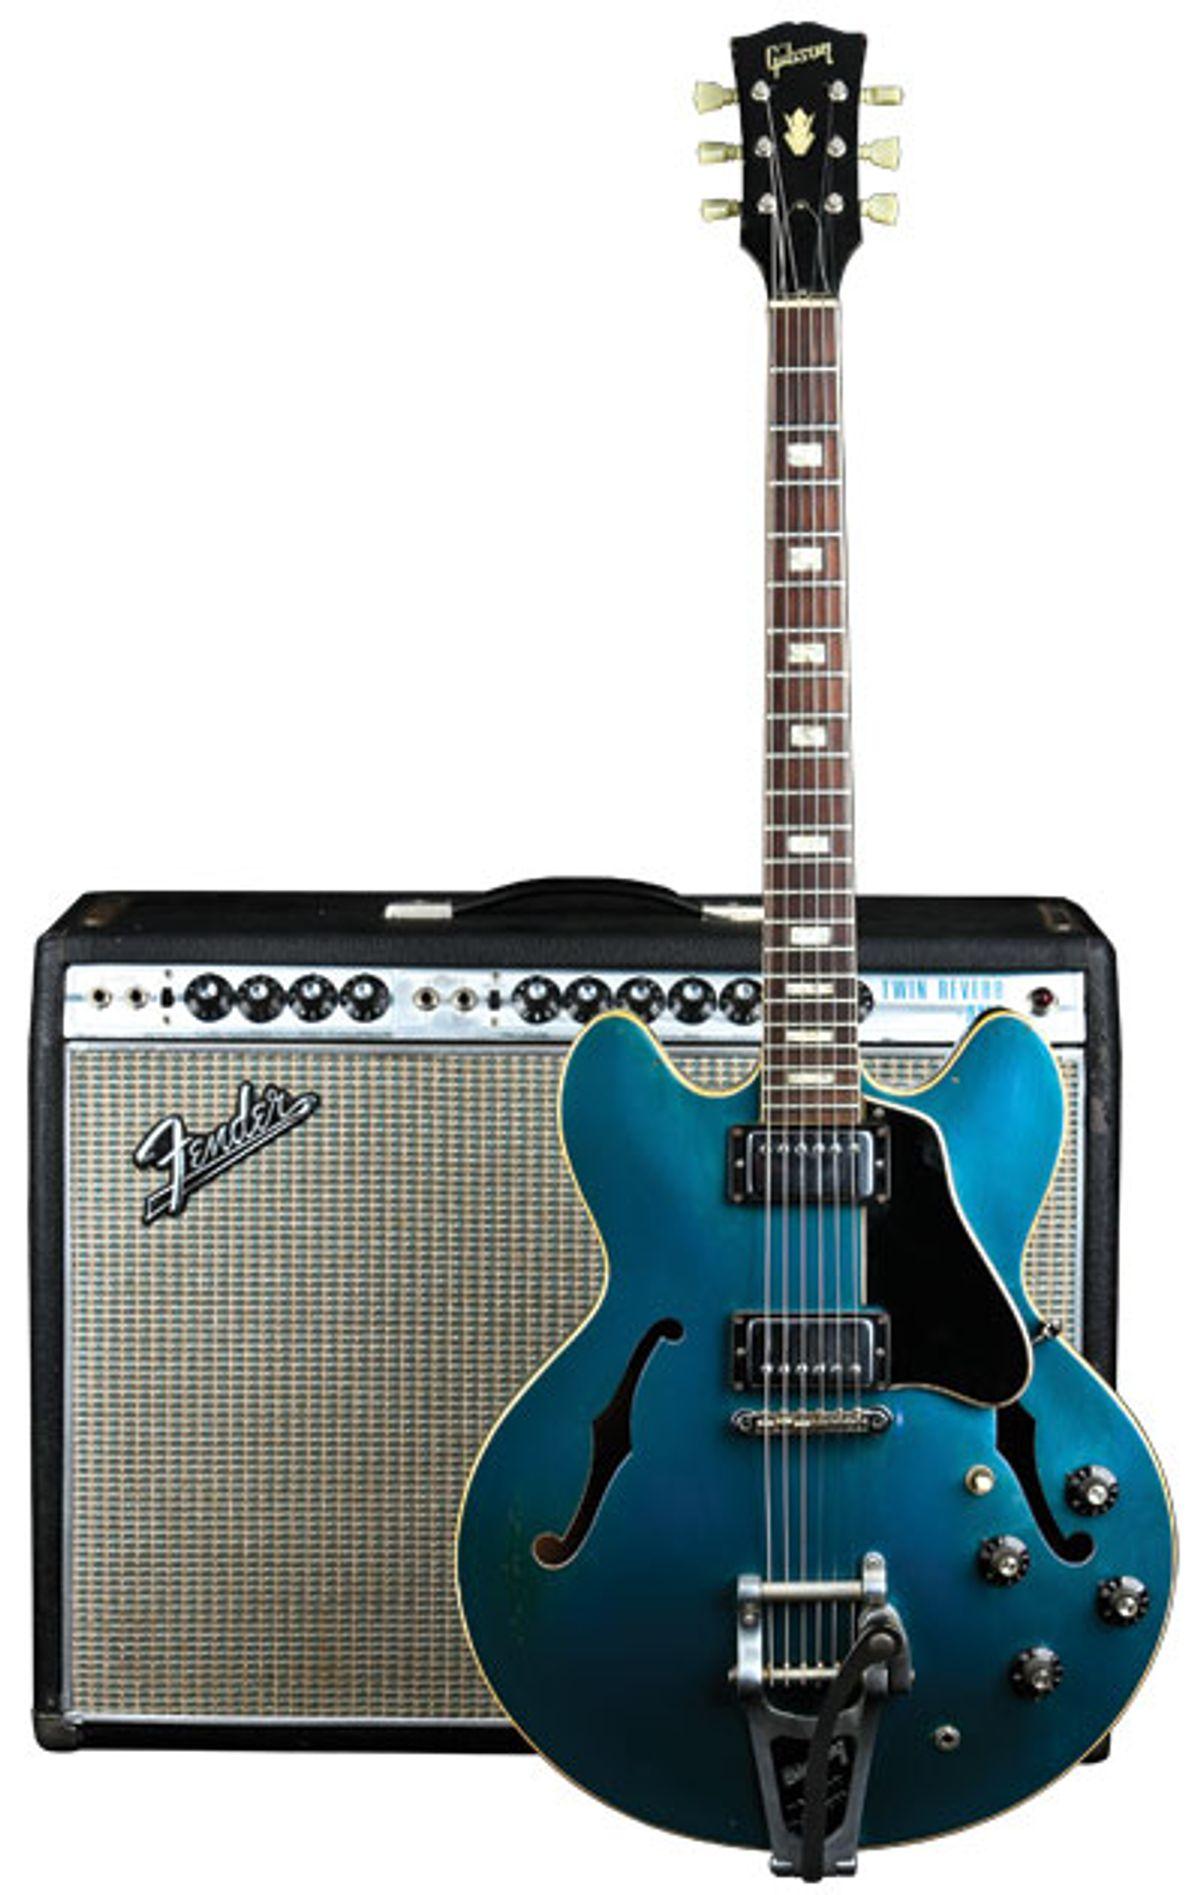 Vintage Vault: 1967 Gibson ES-335TD Pelham Blue